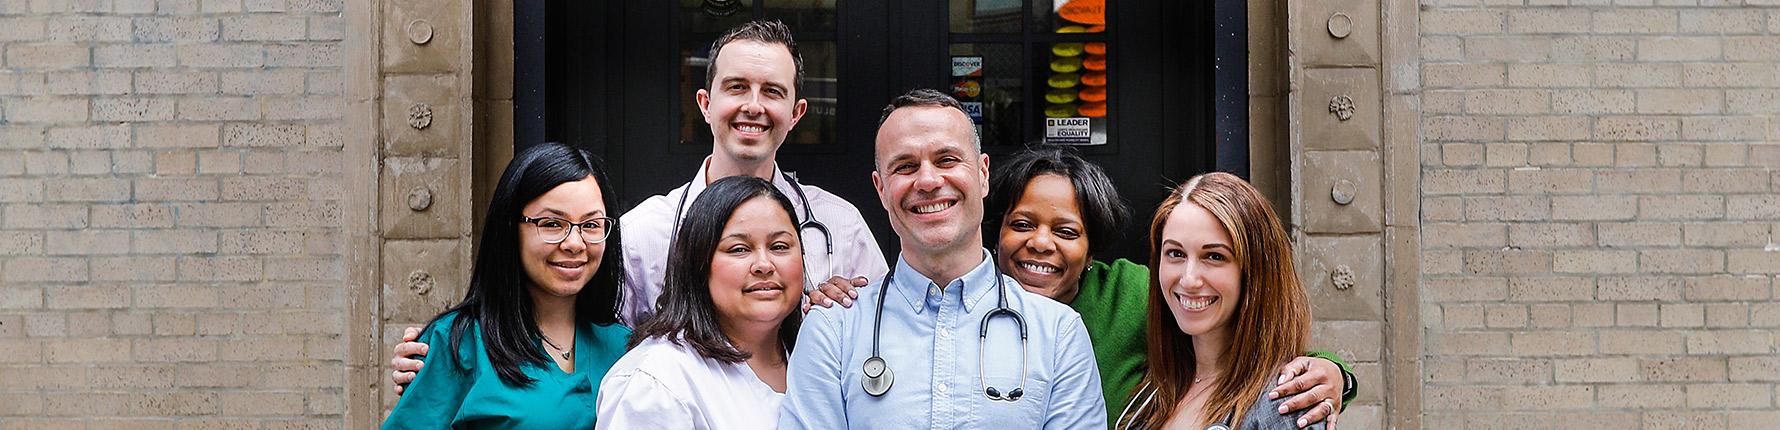 The Pride Health Center at NYC Health + Hospitals/Gotham Health, Judson